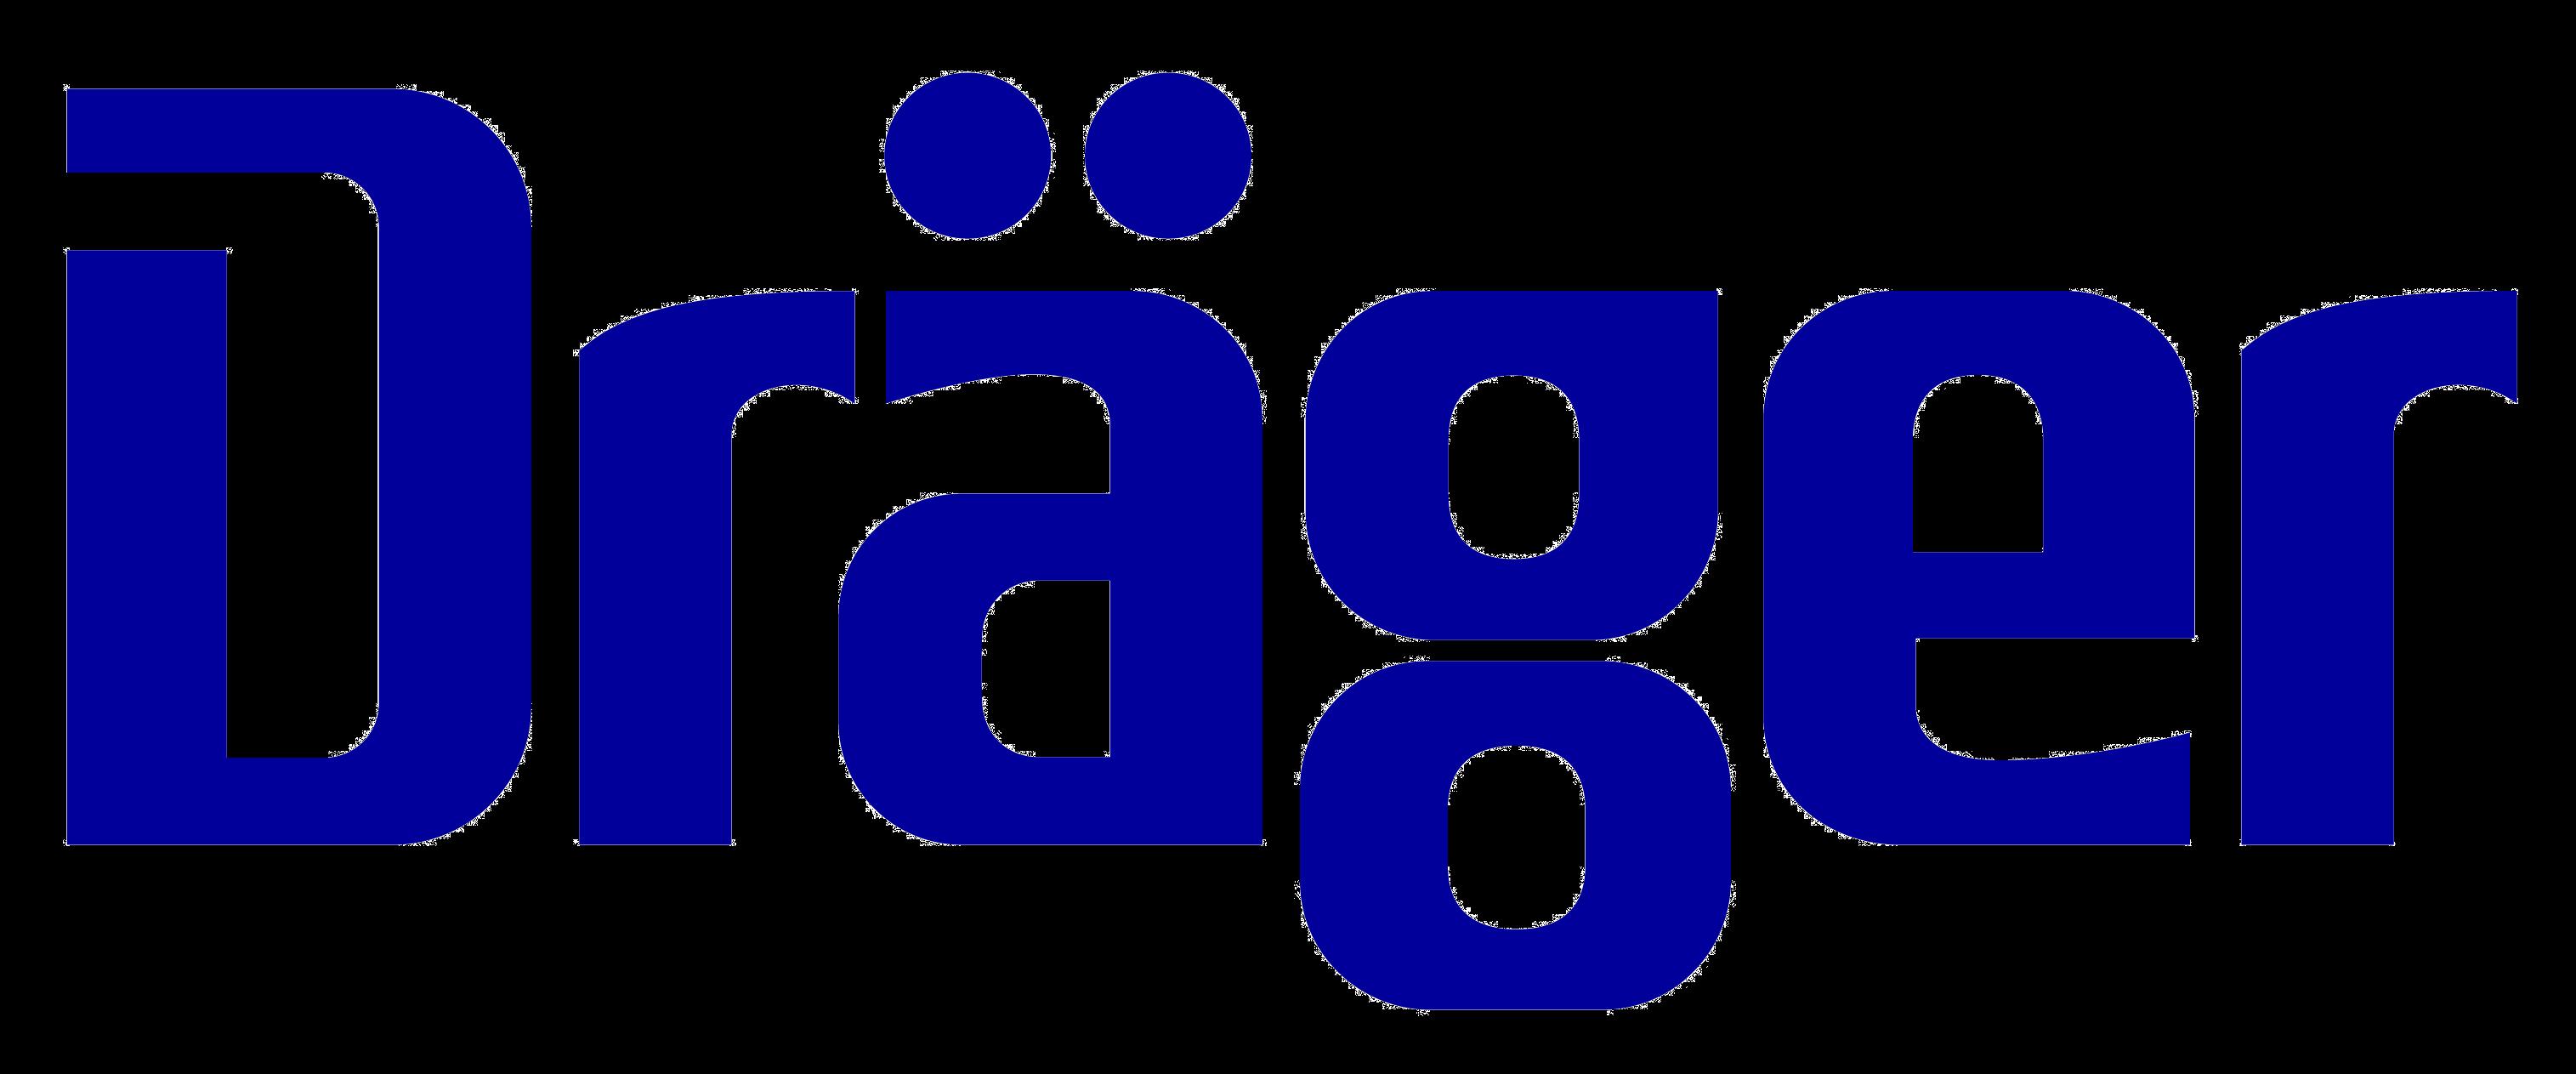 dräger-logo.png